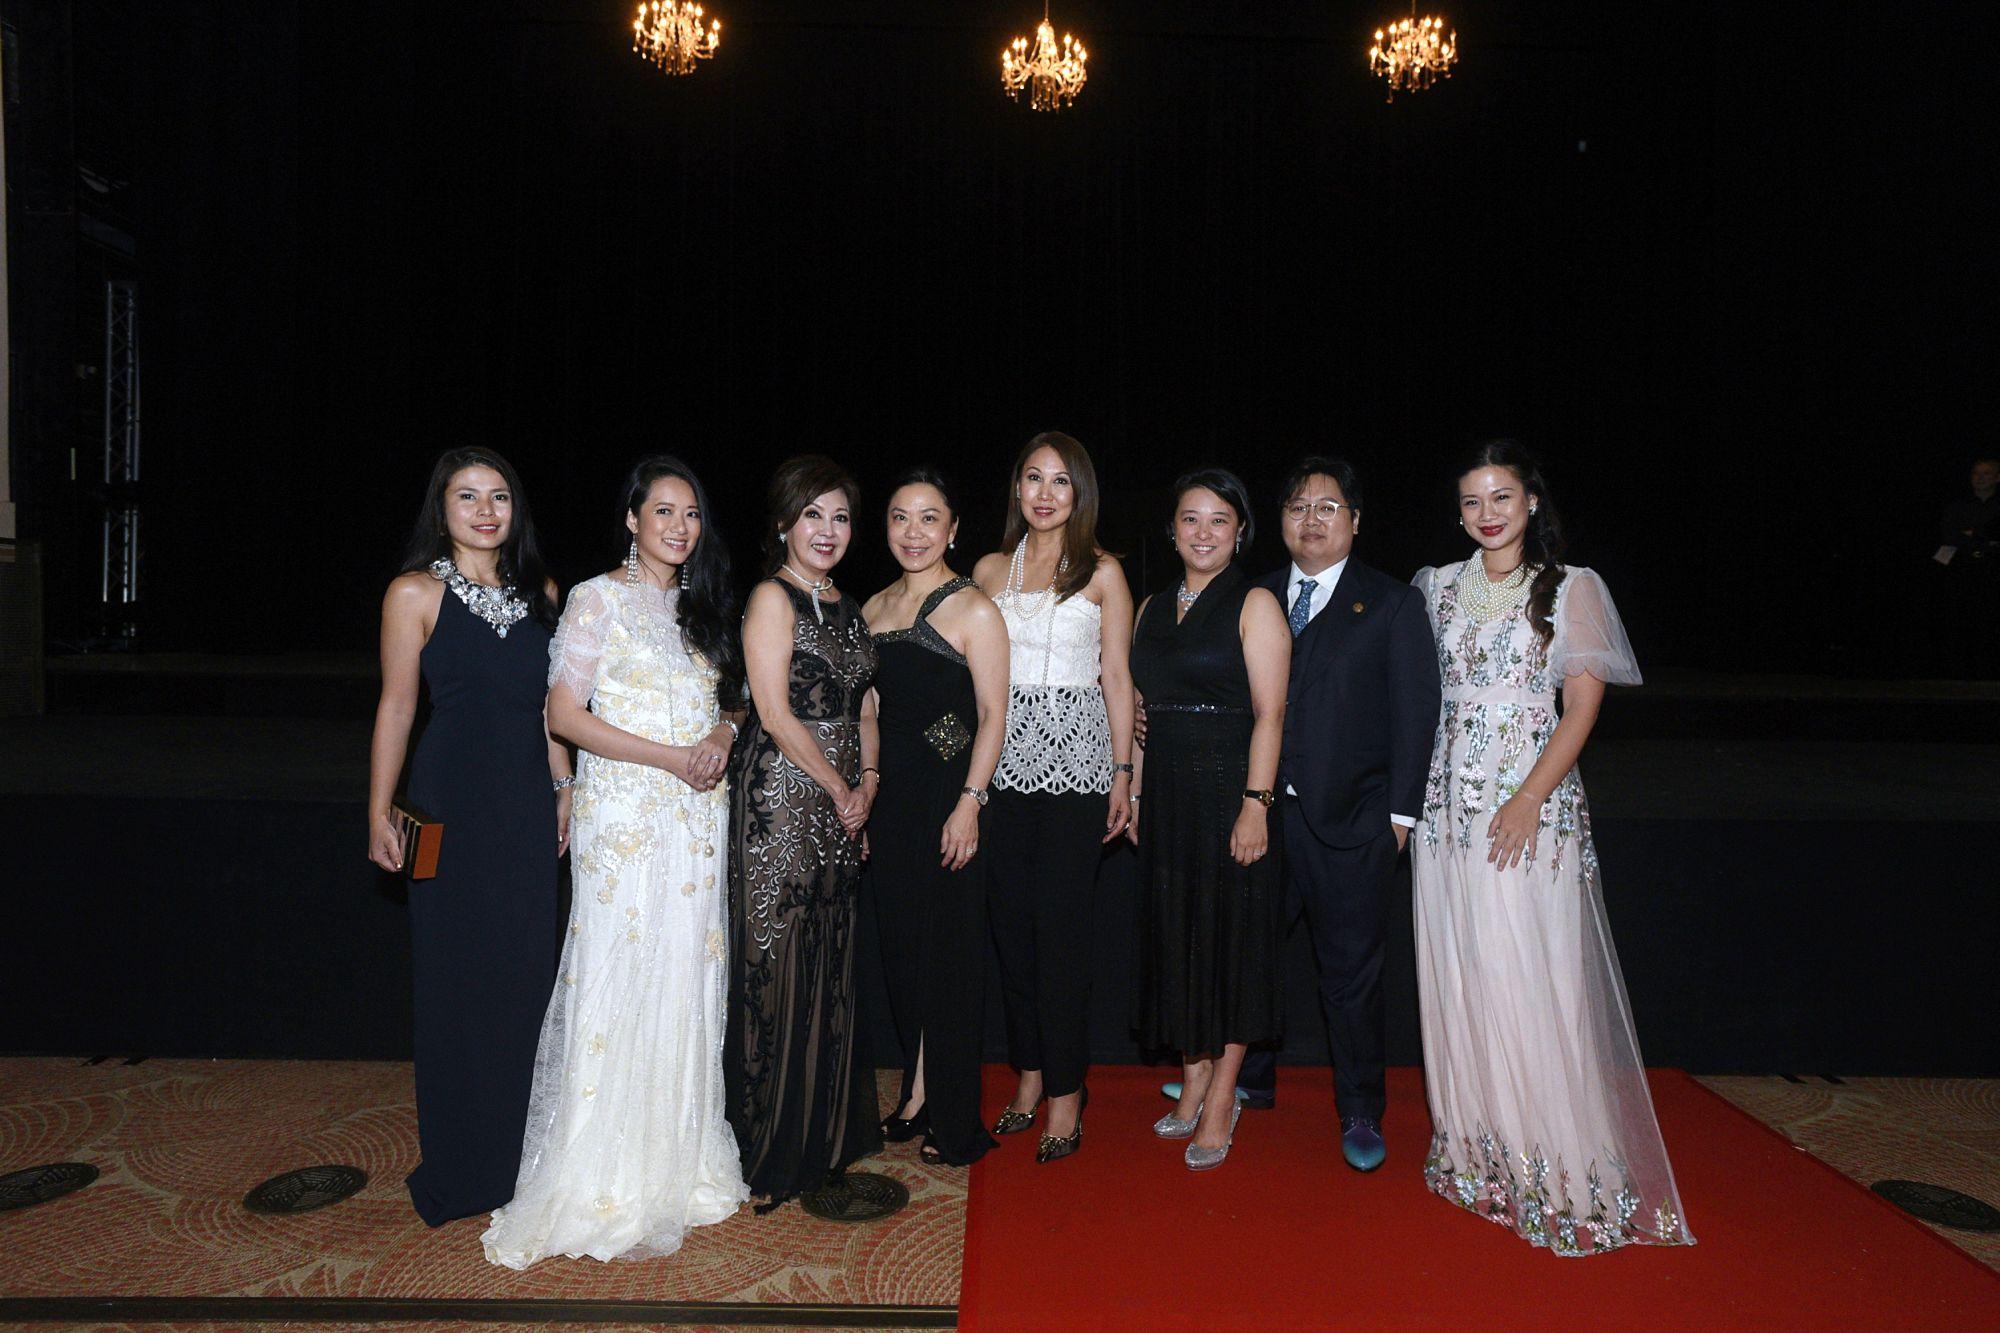 Marilyn Lum, Elaine Kim, Laura Hwang, Ann Tan, June Goh, Gek Hwang, Christopher Hwang, Tjin Le